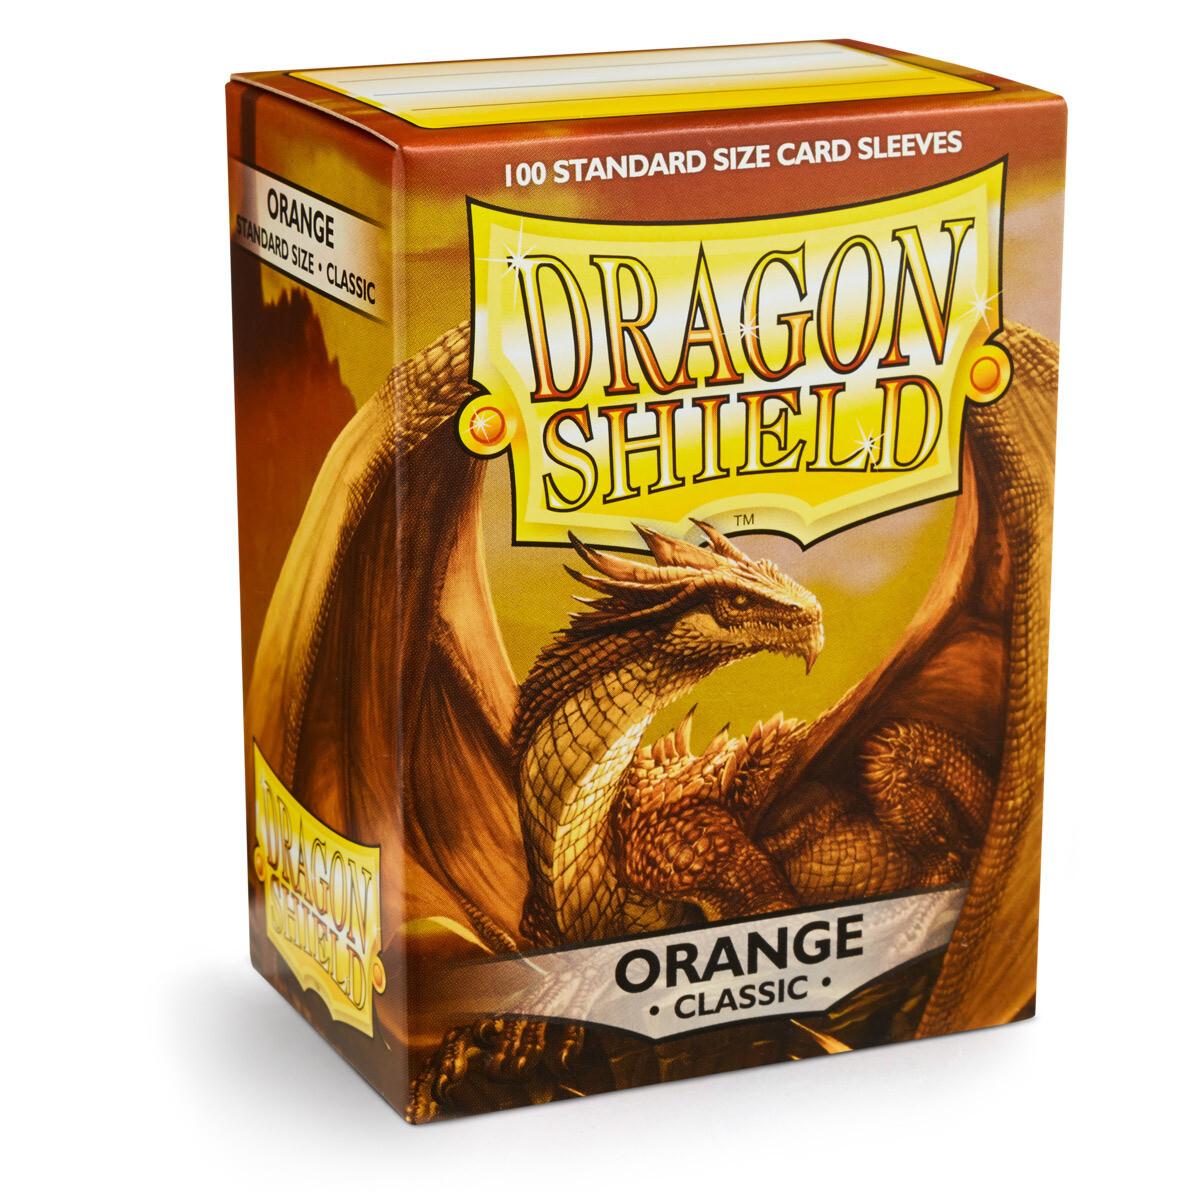 Dragon Shield 100 Sleeves - Orange